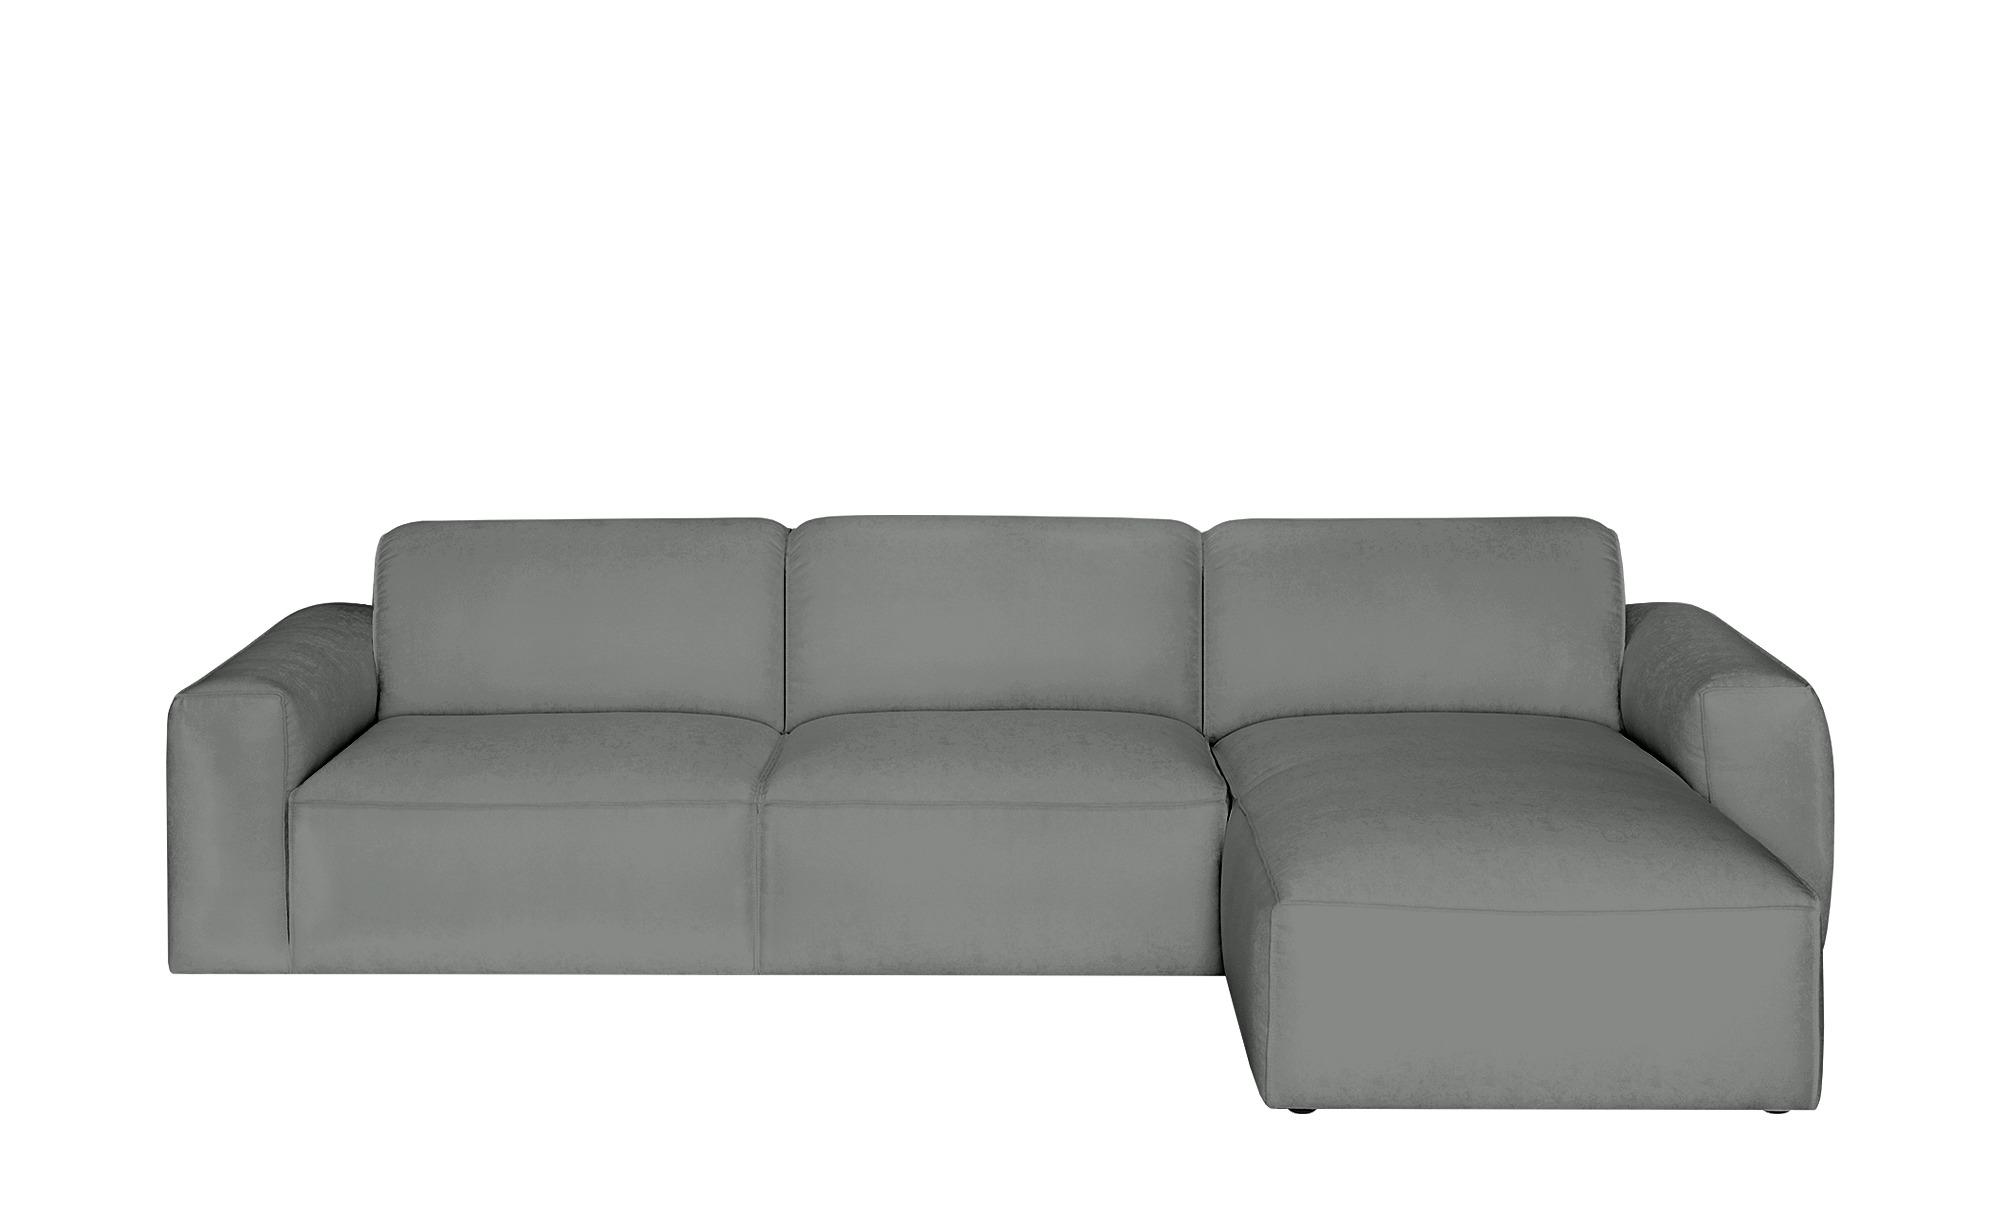 Gray & Jones Ecksofa  Factory ¦ grau ¦ Maße (cm): H: 75 T: 100 Polstermöbel > Sofas > Ecksofas - Höffner